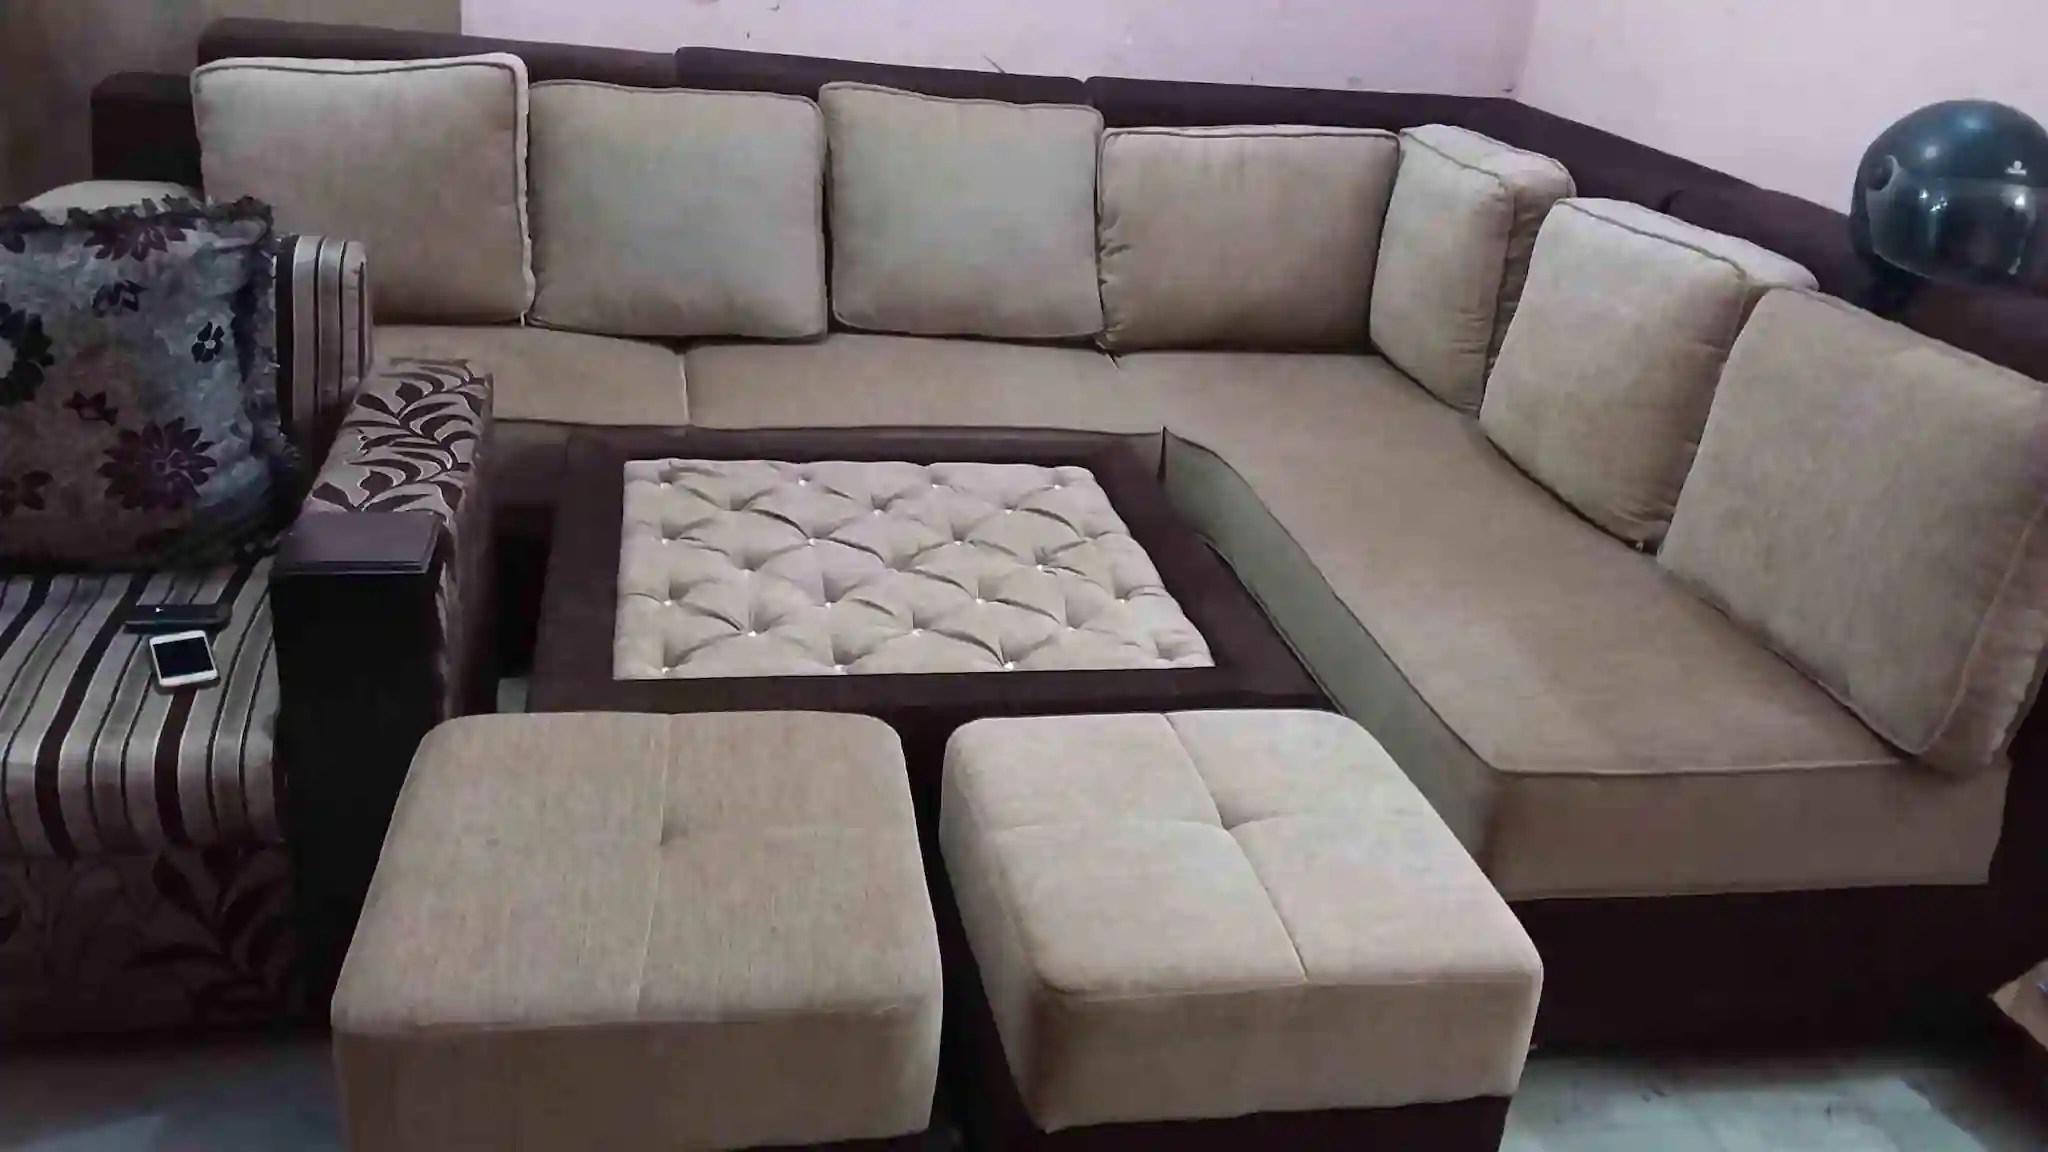 old sofa set in gurgaon ed slipcovers for sectional sofas delhi baci living room